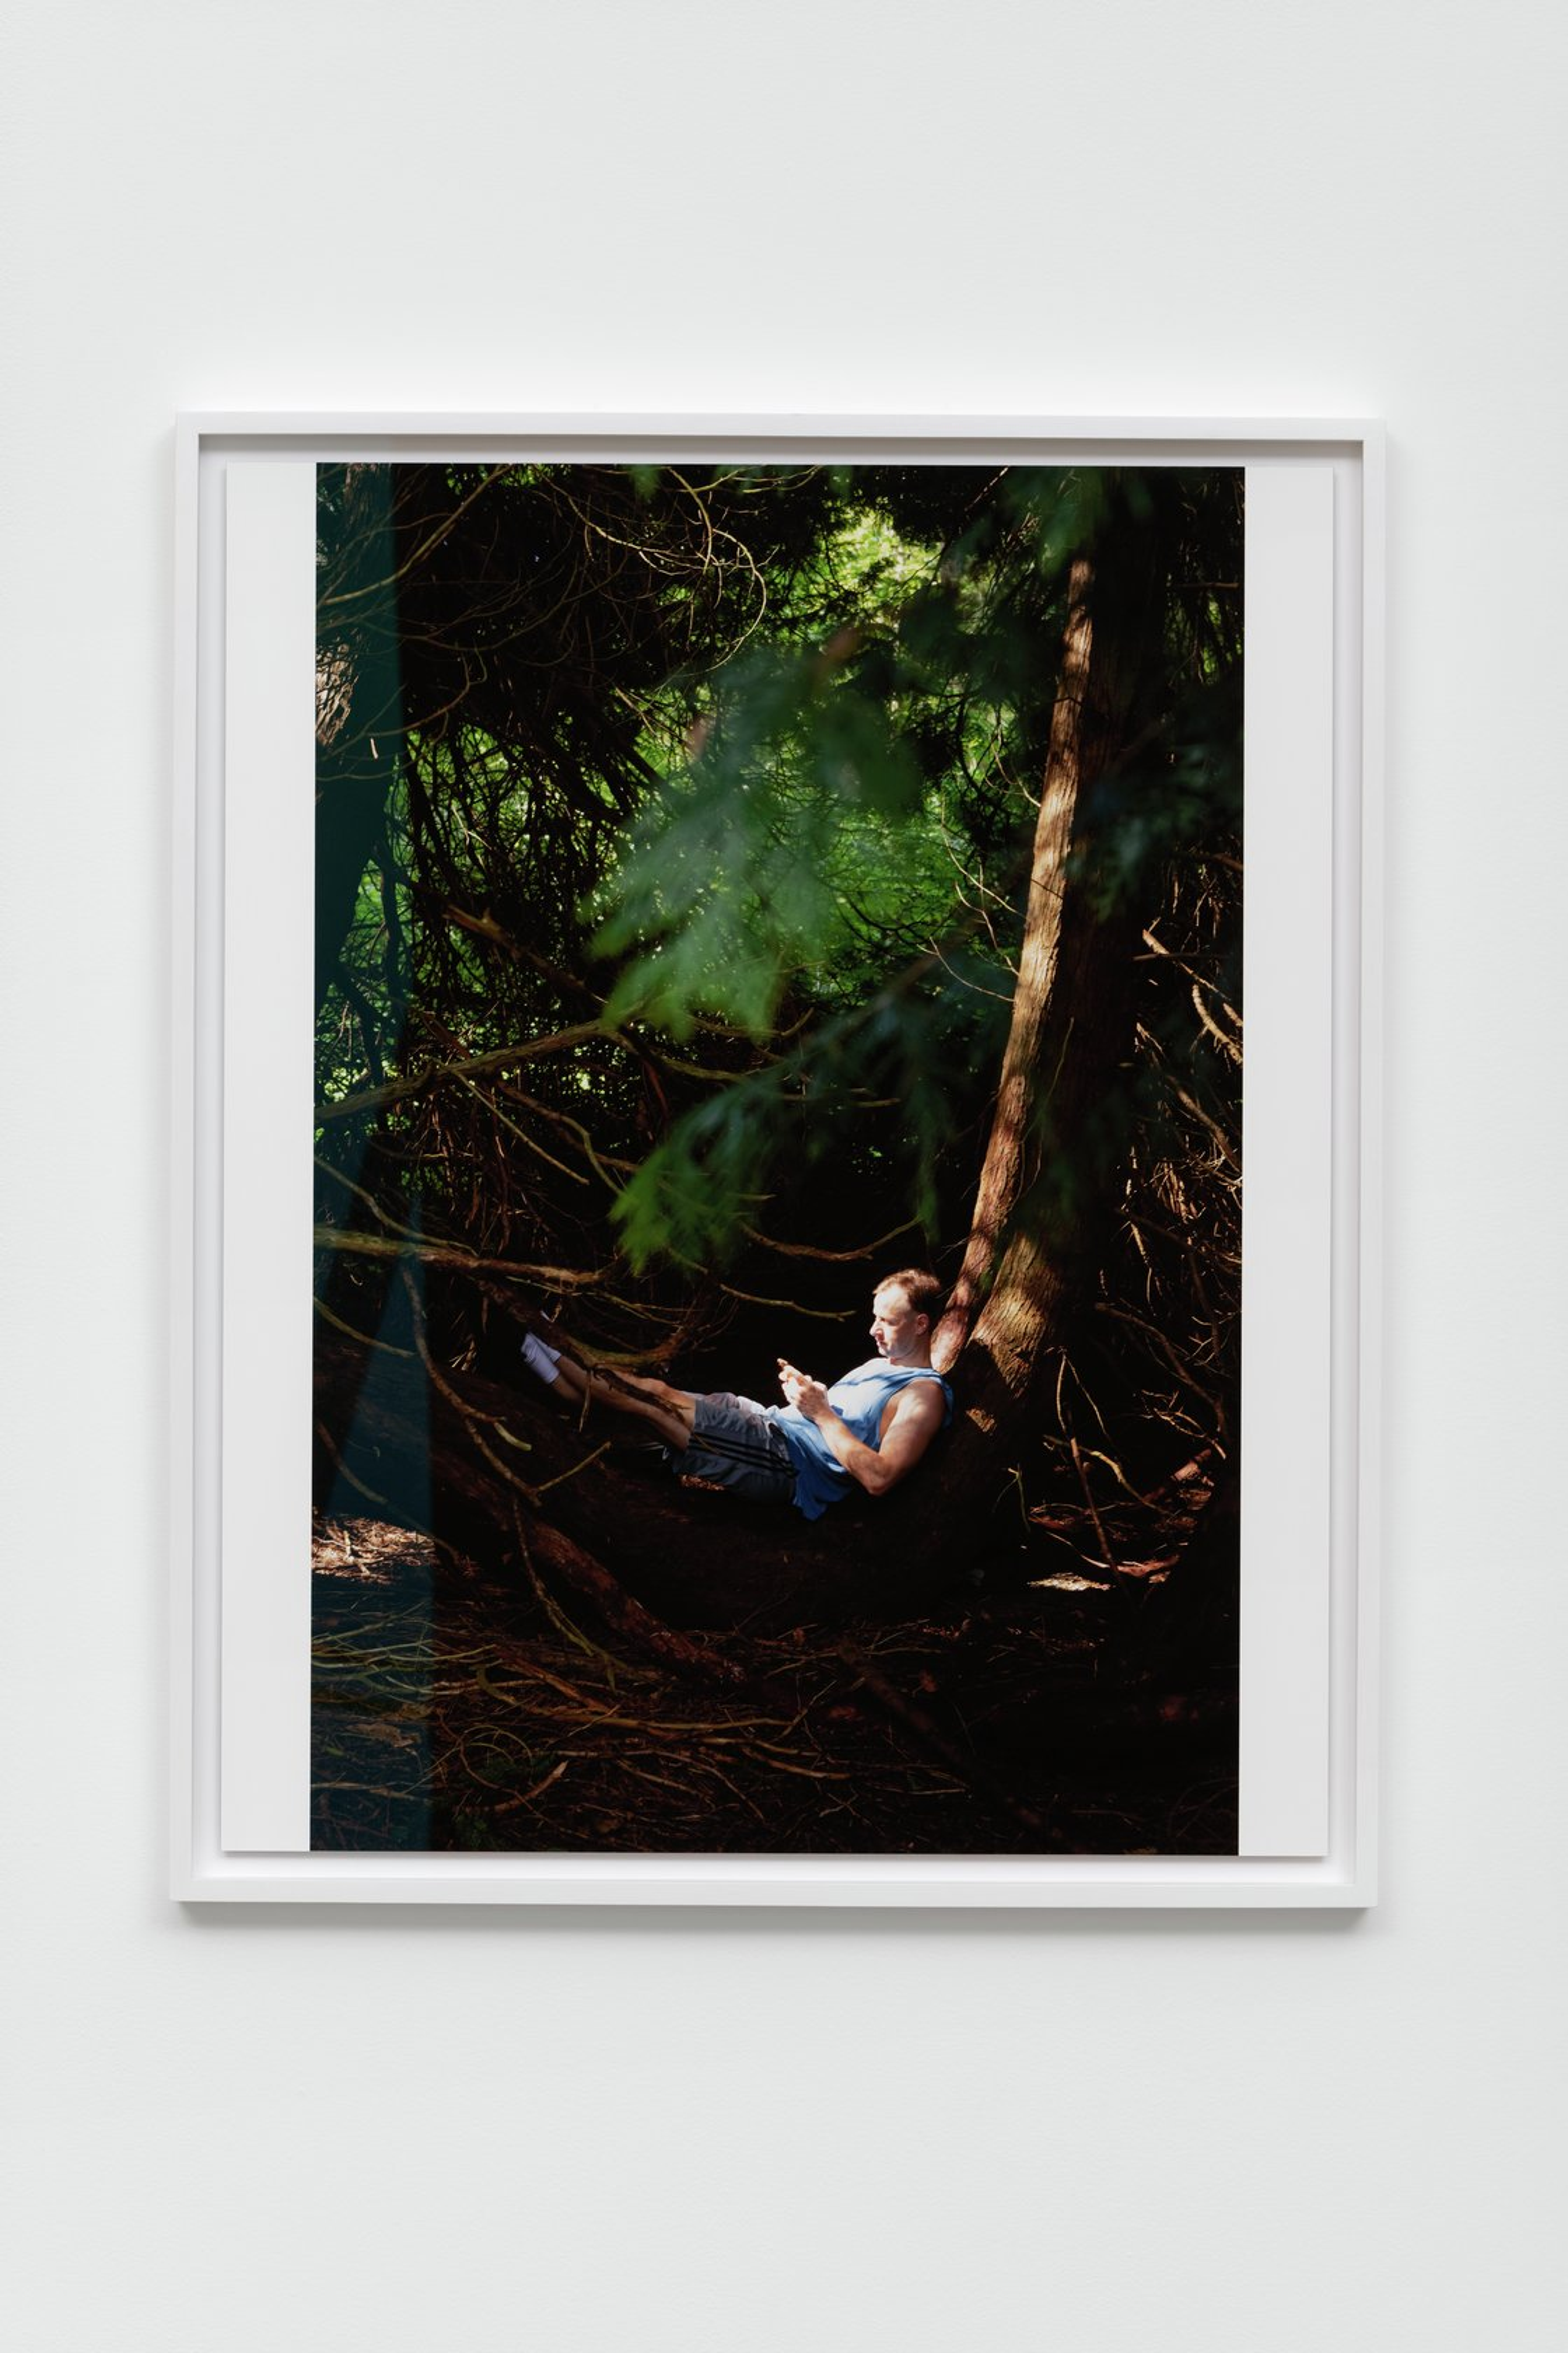 Wolfgang Tillmans, Micha, Arboretum, 2020